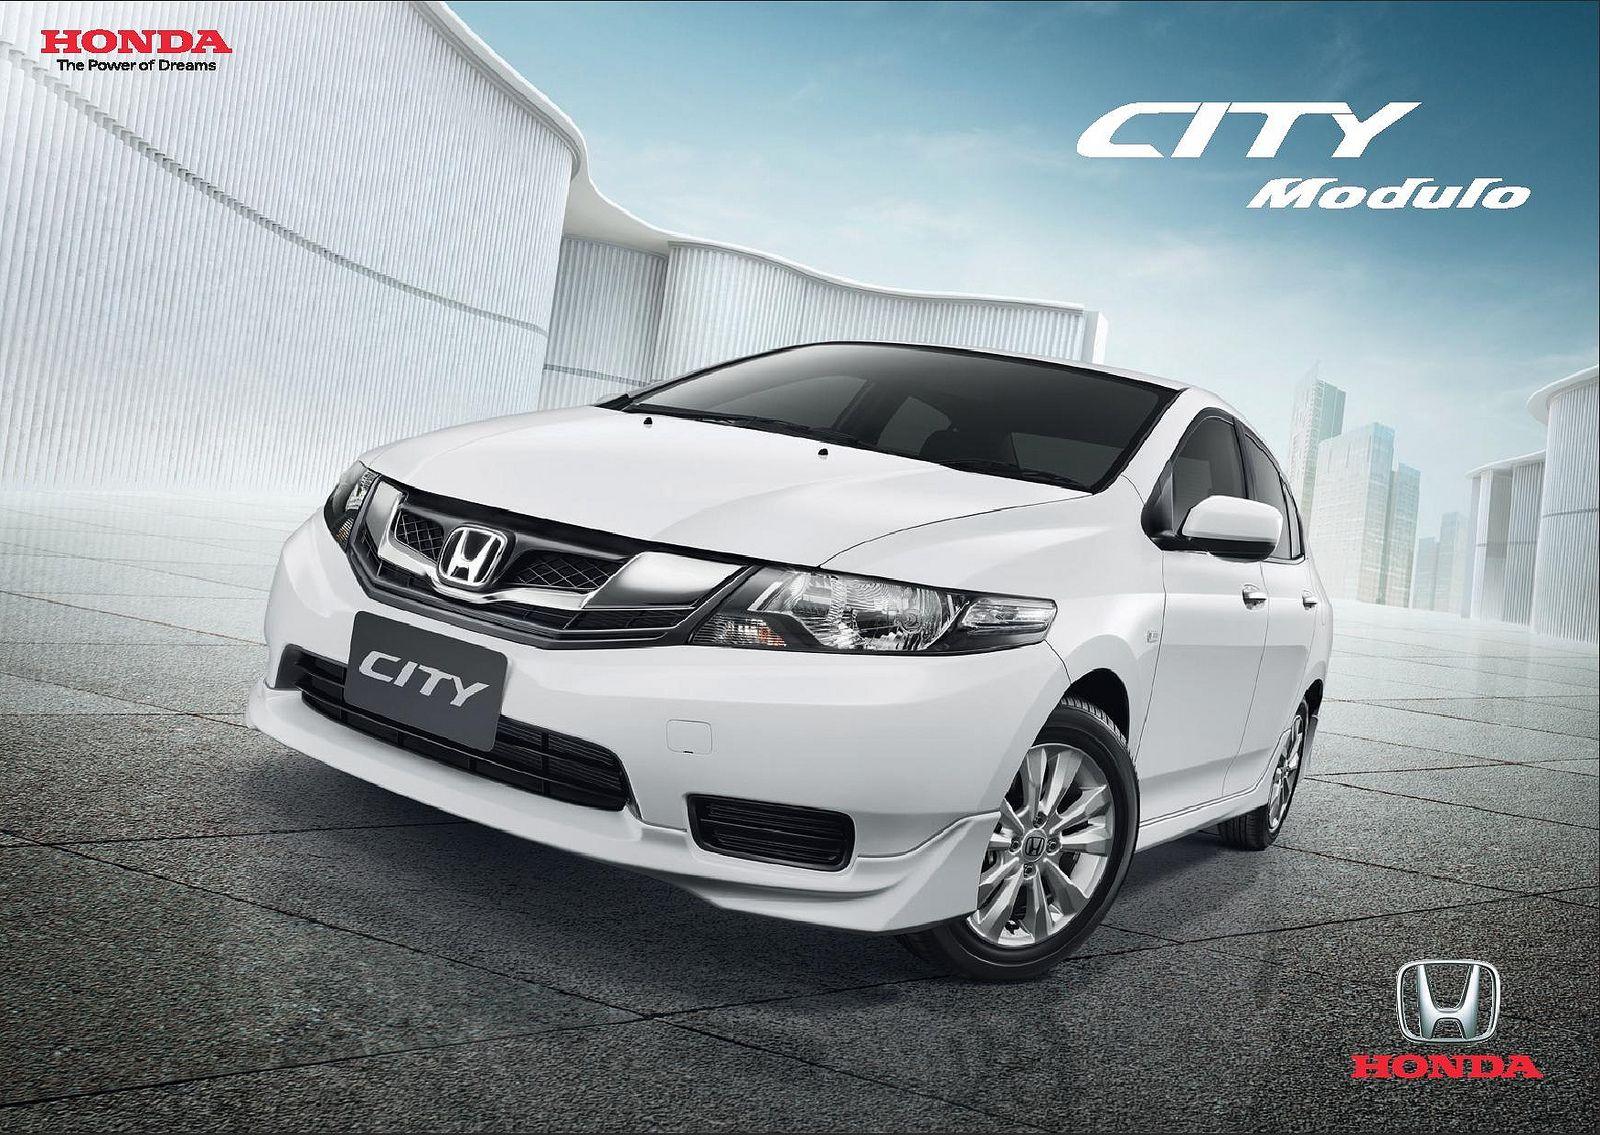 Honda city mk5 modulo thailand brochure 2013